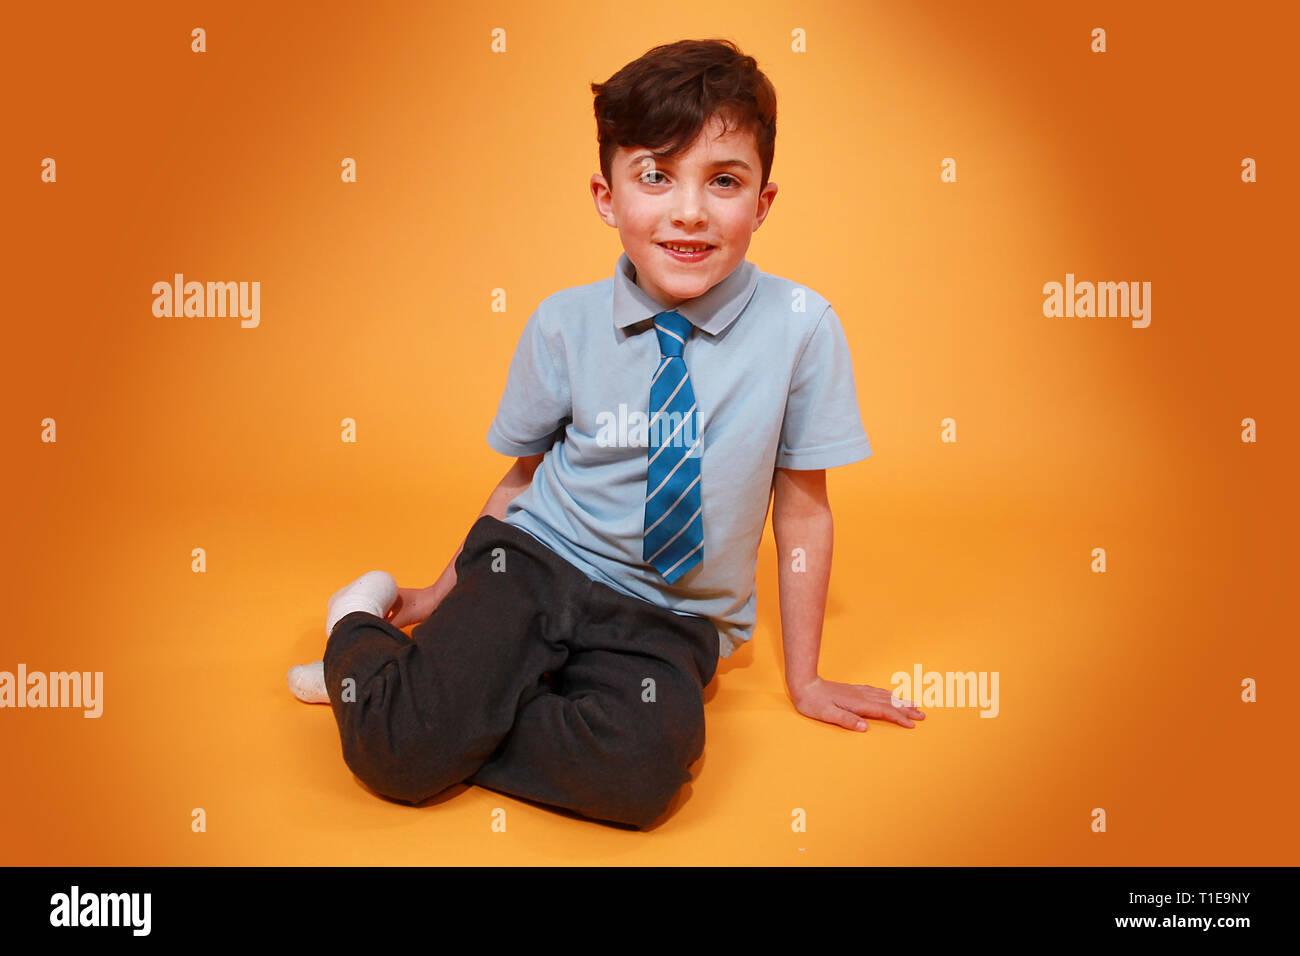 happy young boy in school uniform Stock Photo